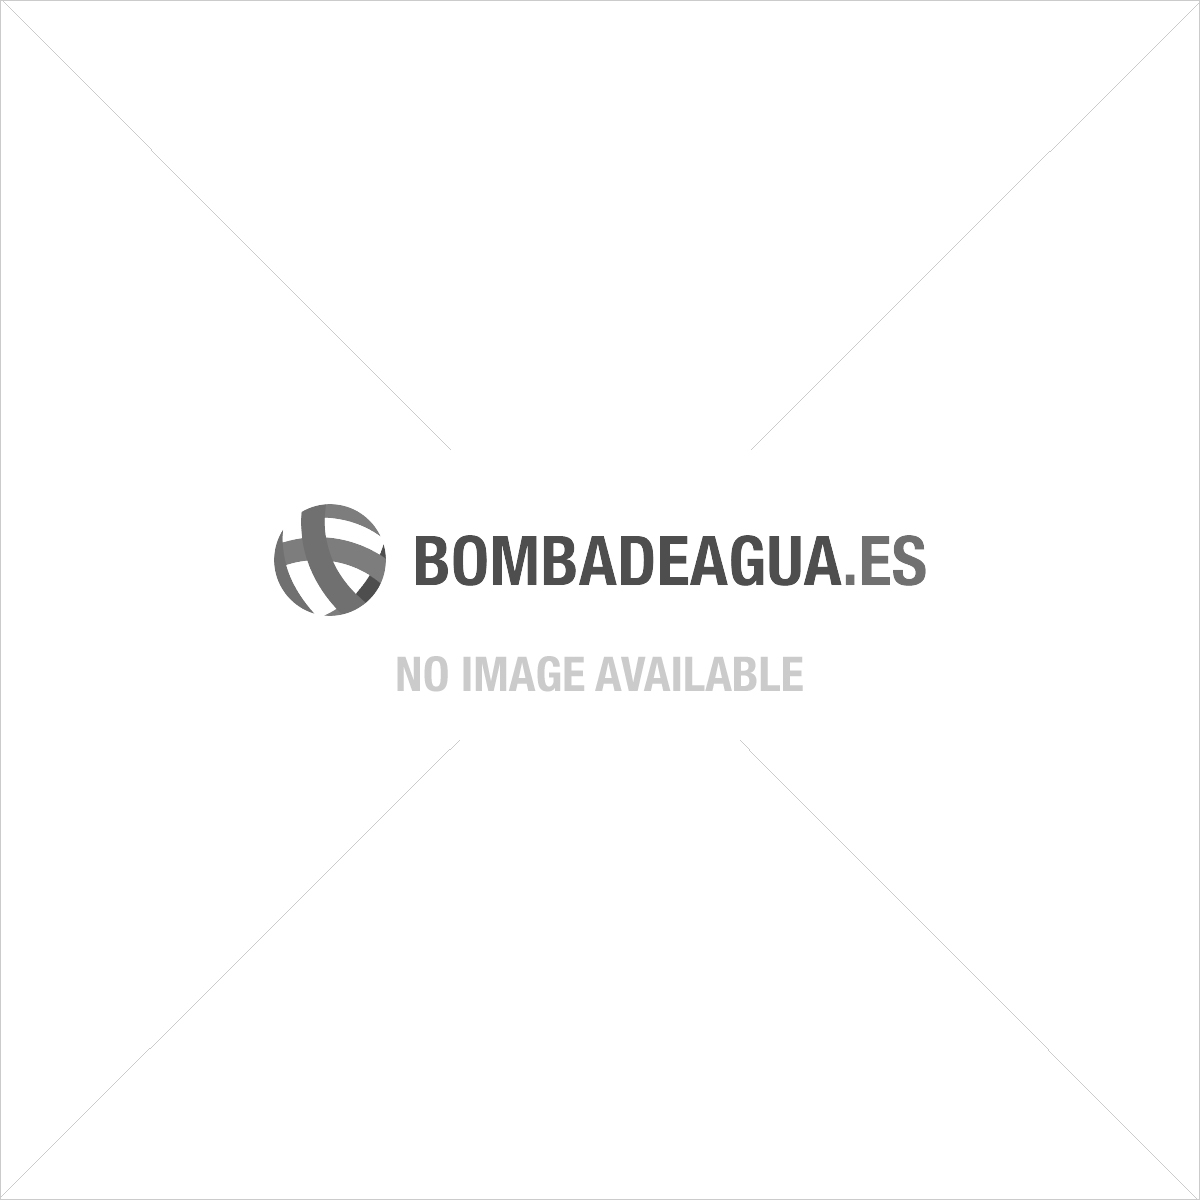 Kit de Bomba de pozo DAB S4C 13M